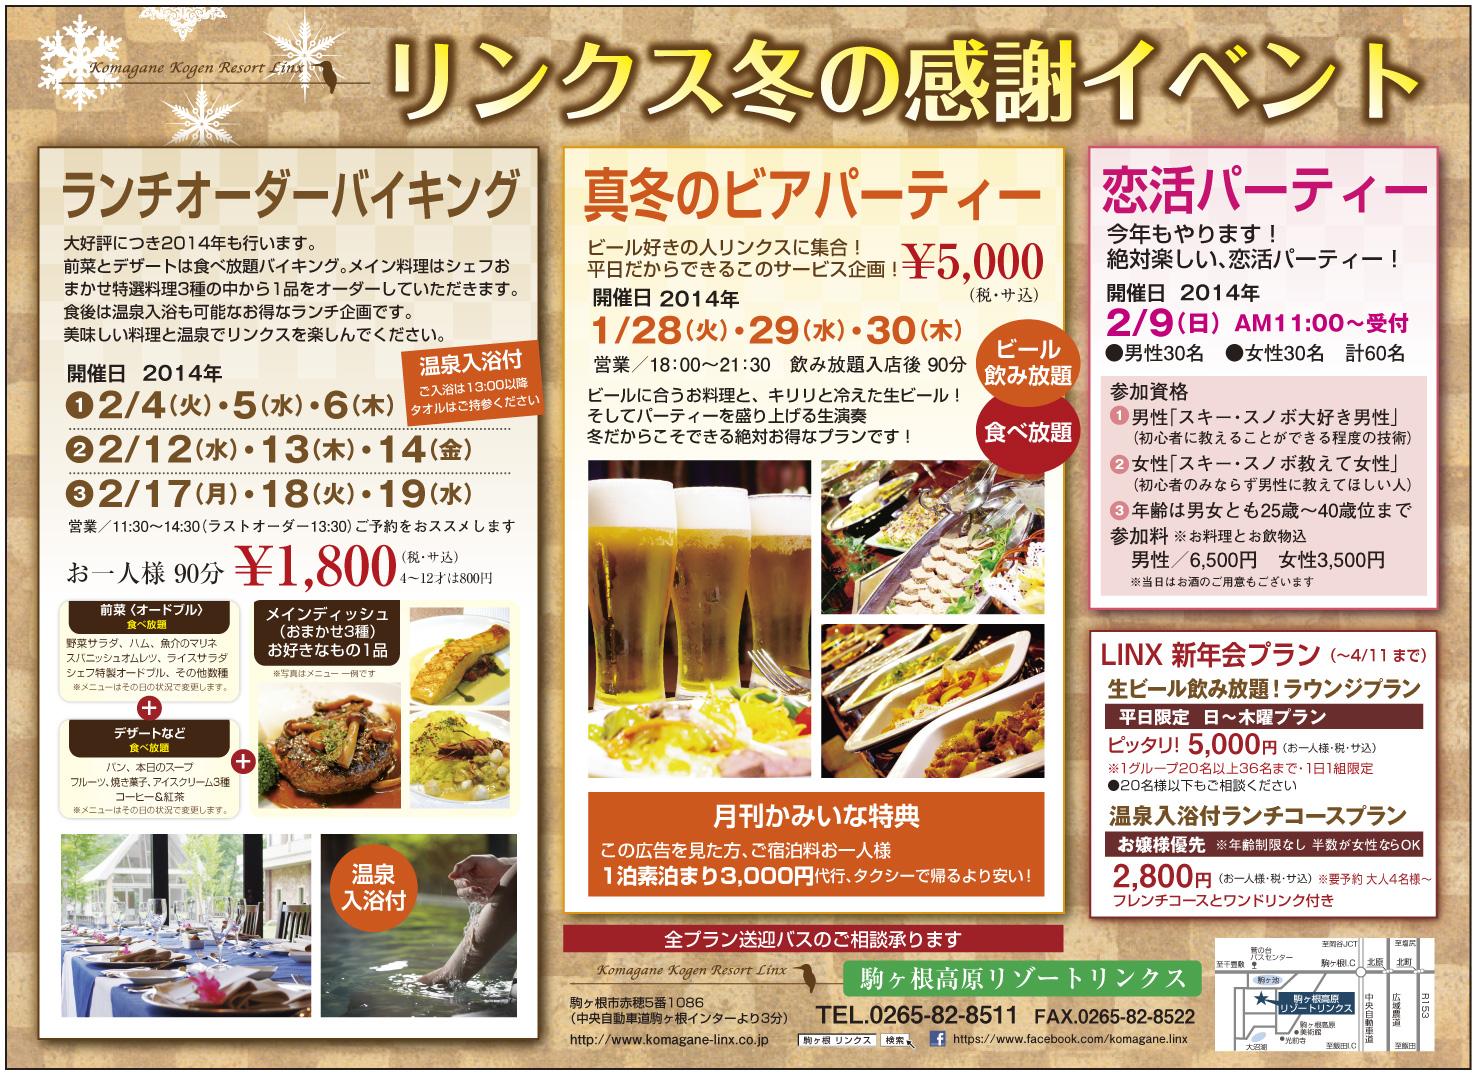 http://www.komagane-linx.co.jp/blogimages/201401-kamiina2.jpg